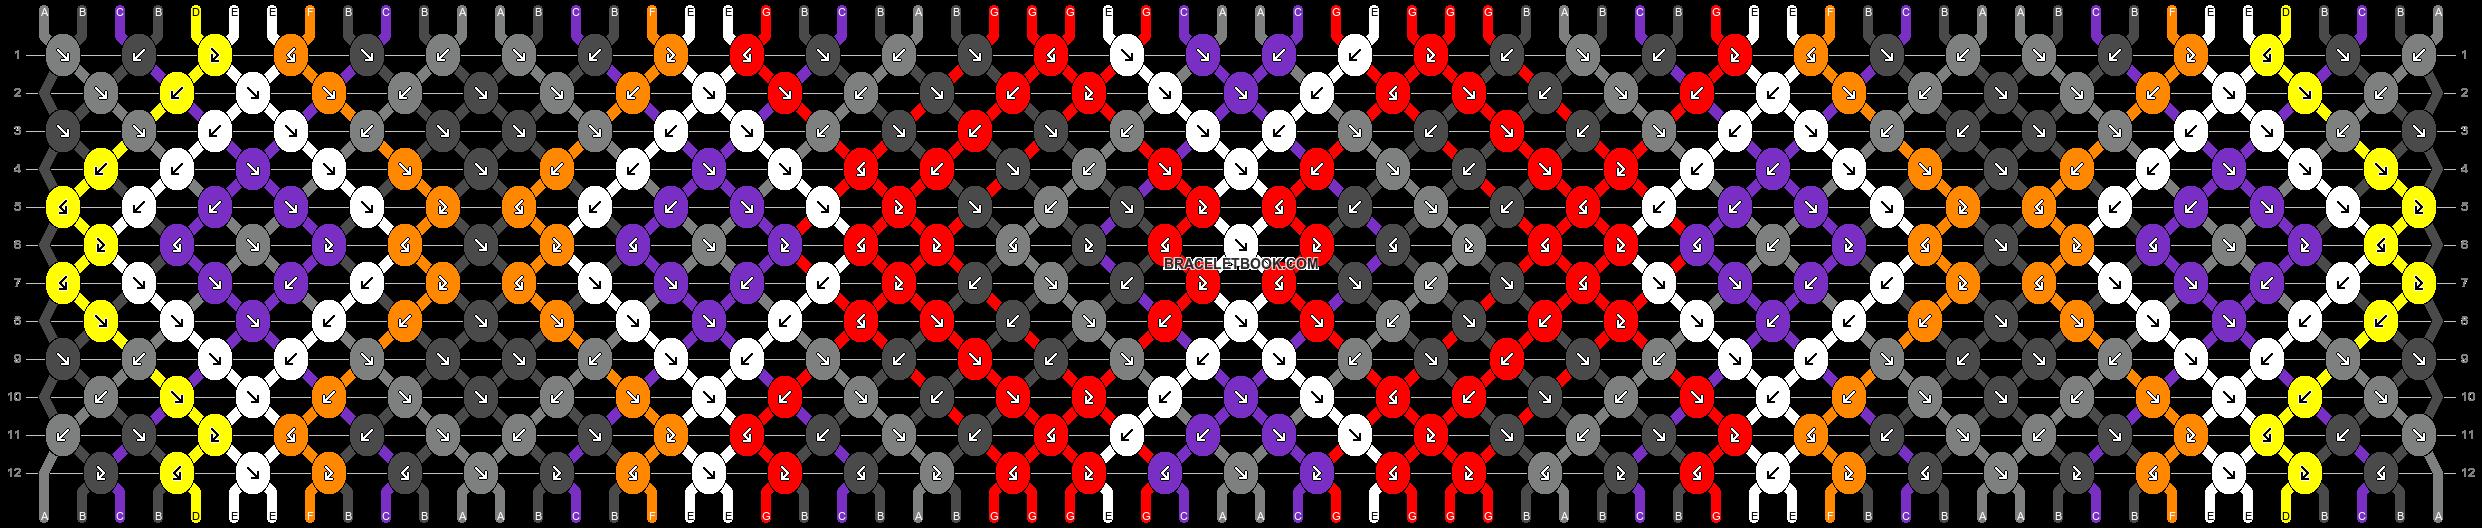 Normal pattern #50755 pattern